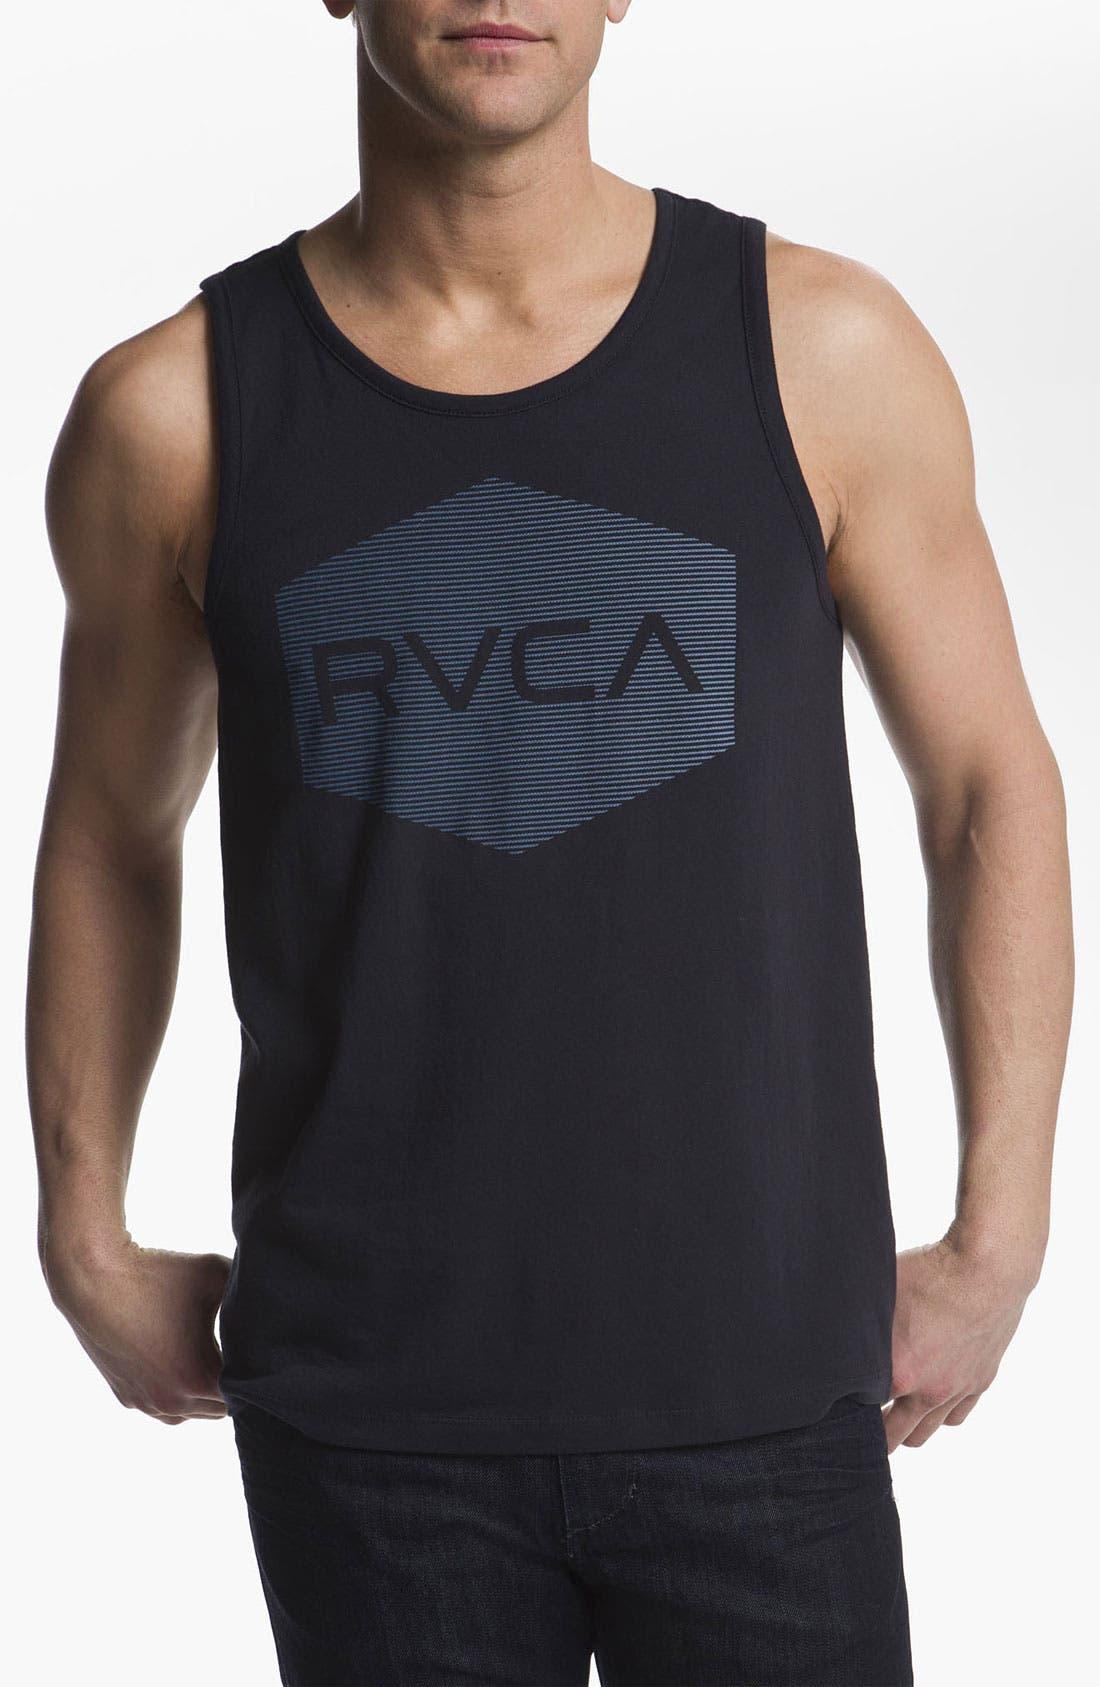 Alternate Image 1 Selected - RVCA 'Halftone Hex' Tank Top